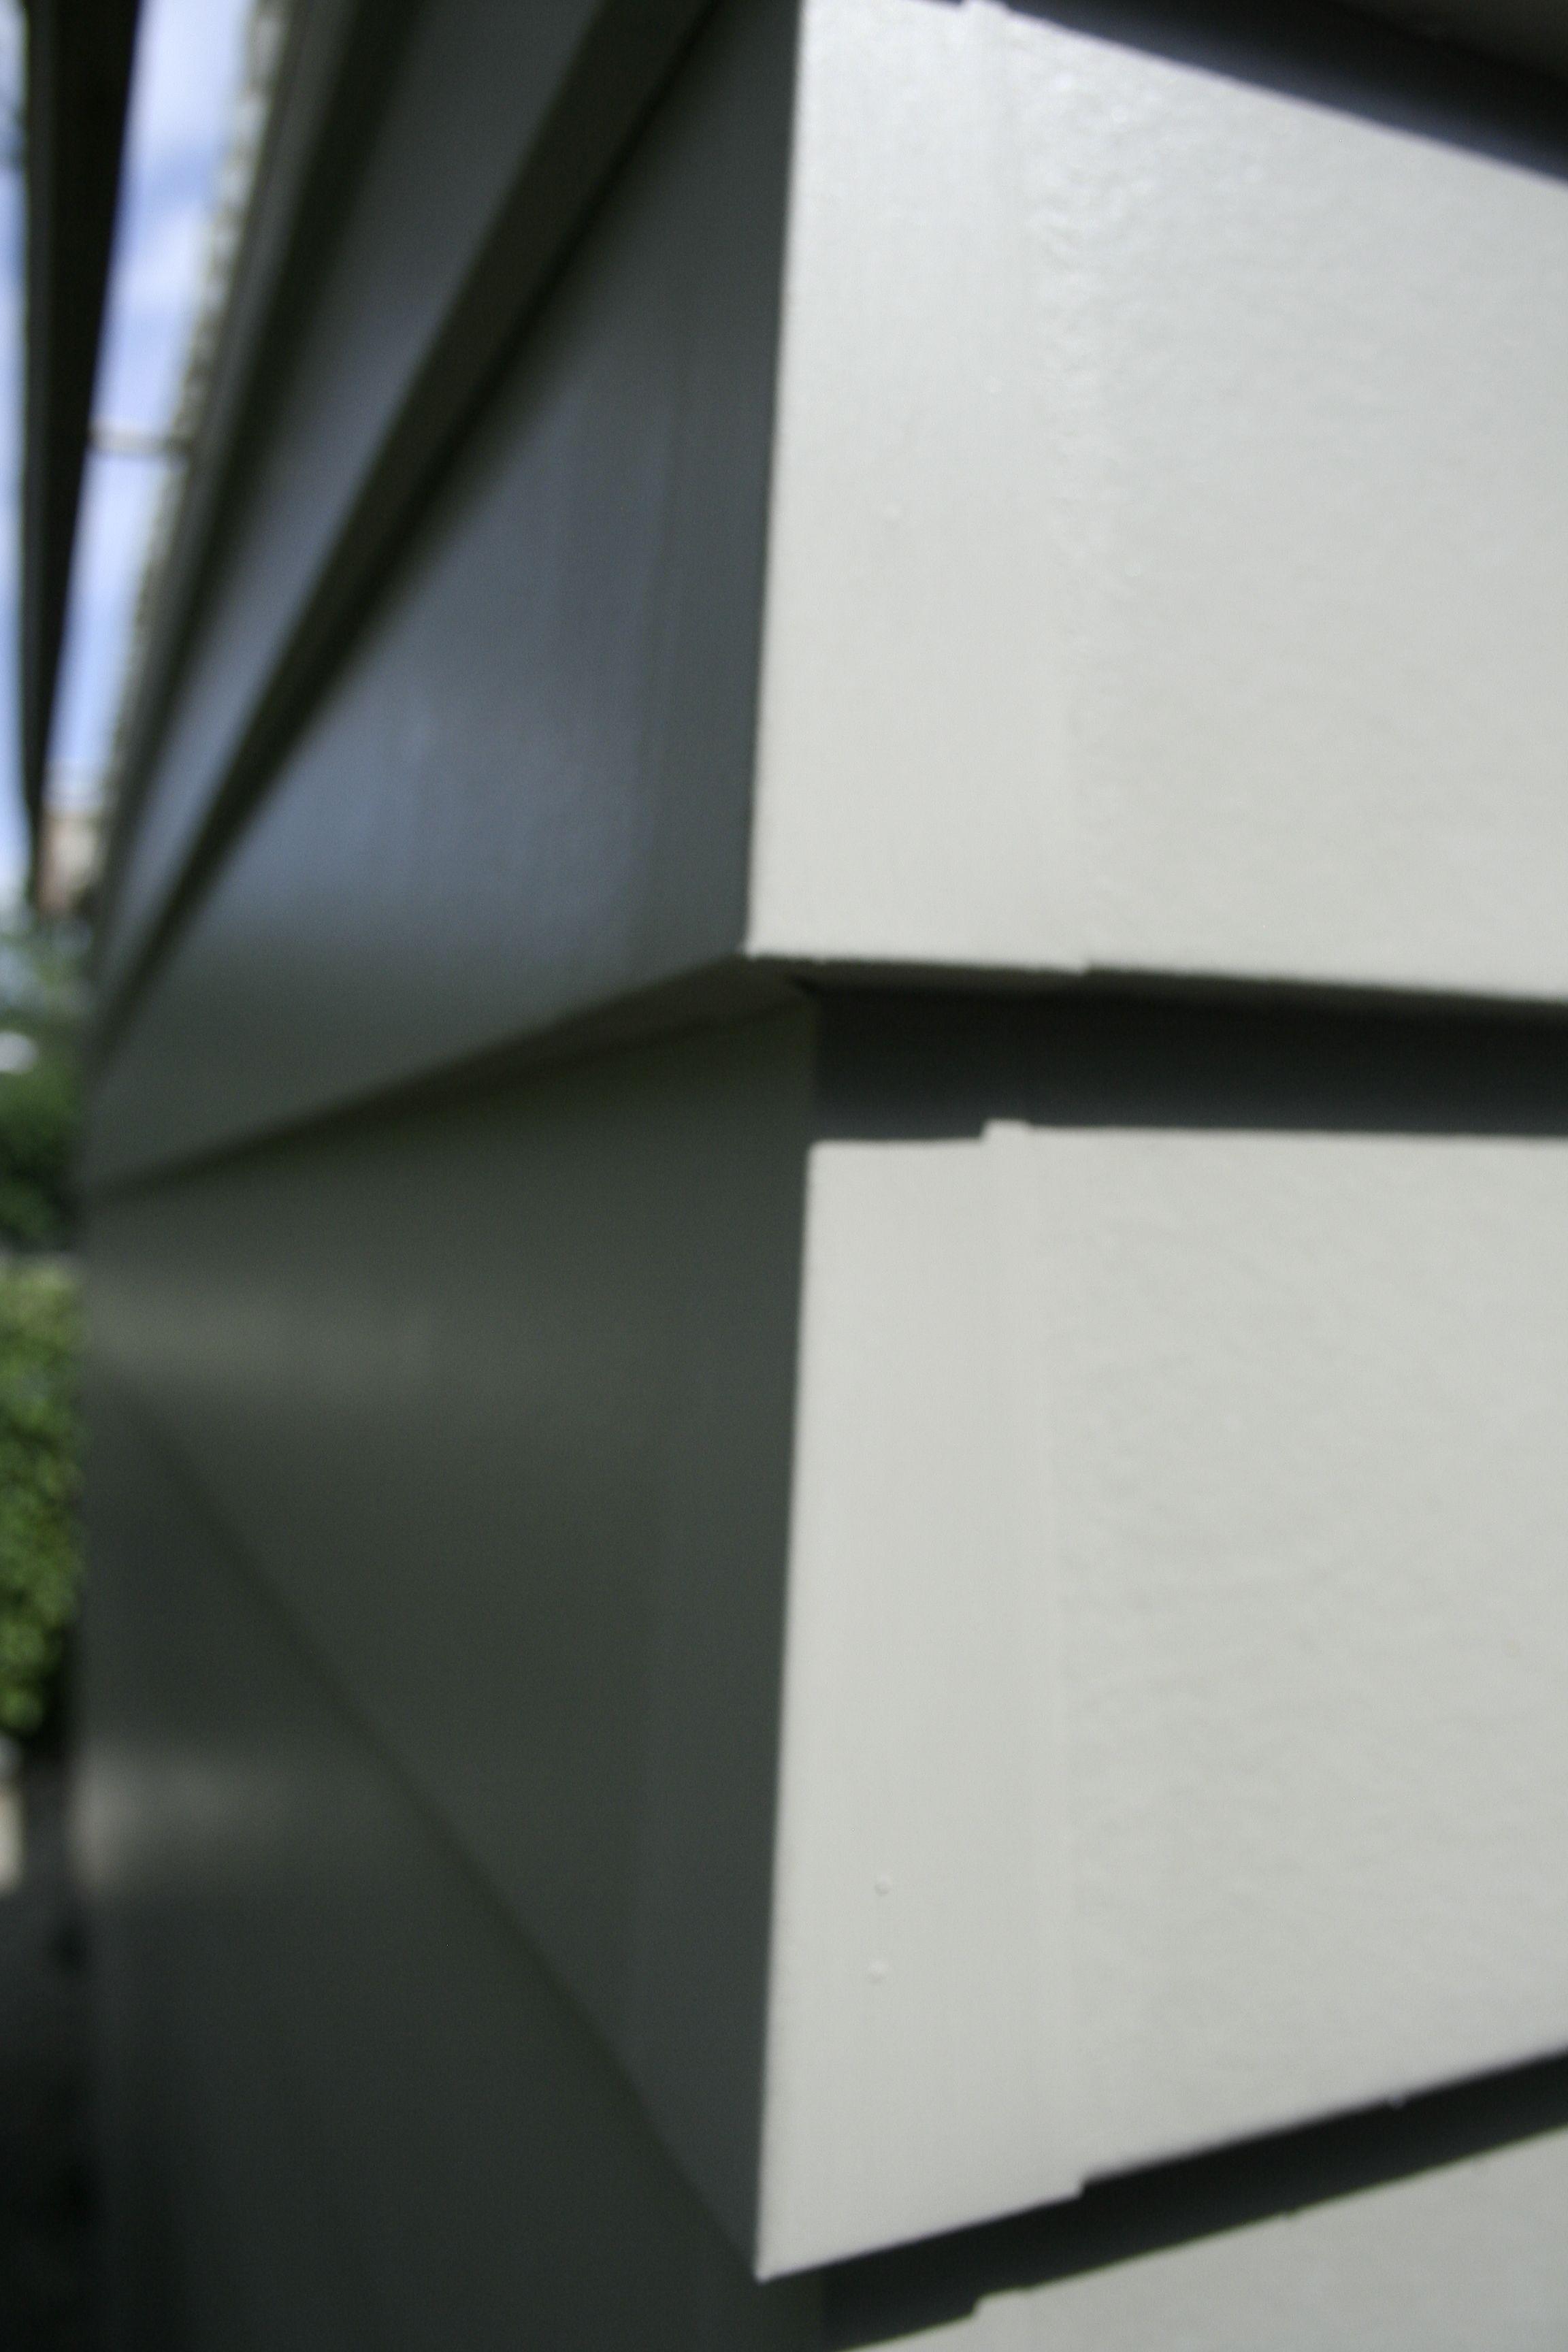 Aluminum Edge Trim For Tiles Outside Corner Concealed Mosaictec Rjf Profilitec In 2020 Tile Edge Tile Edge Trim Tile Trim